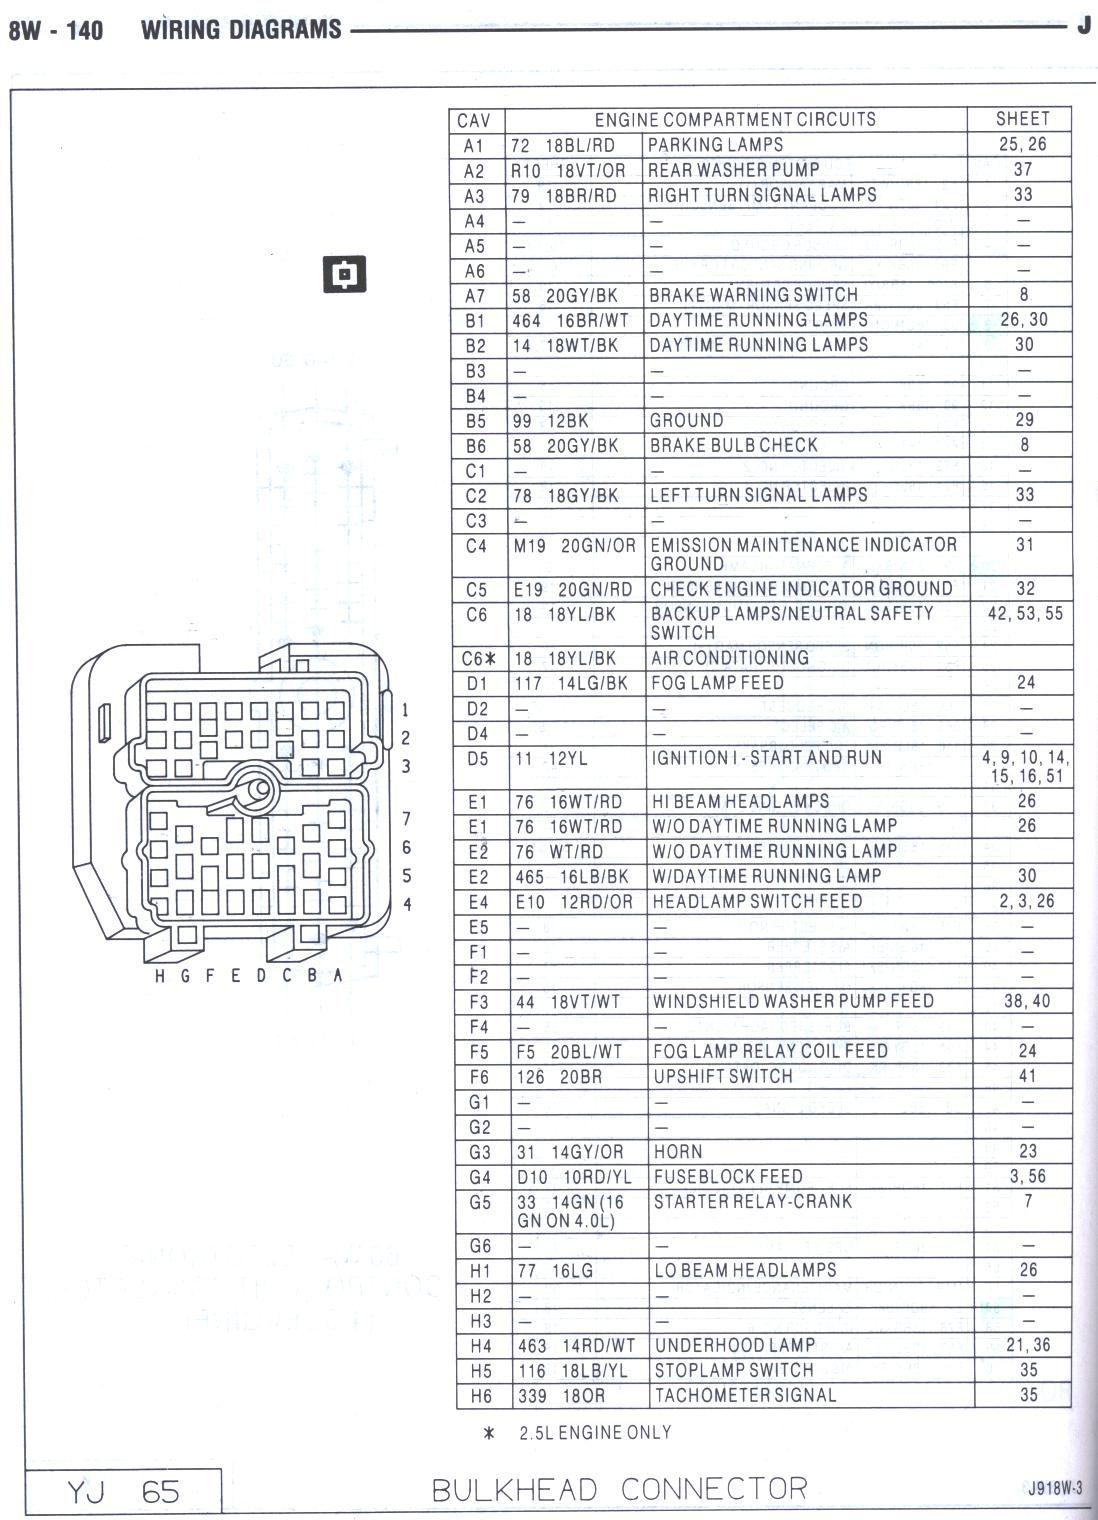 89 jeep cherokee stereo wiring diagram light reactions photosystem 87 yj bulkhead